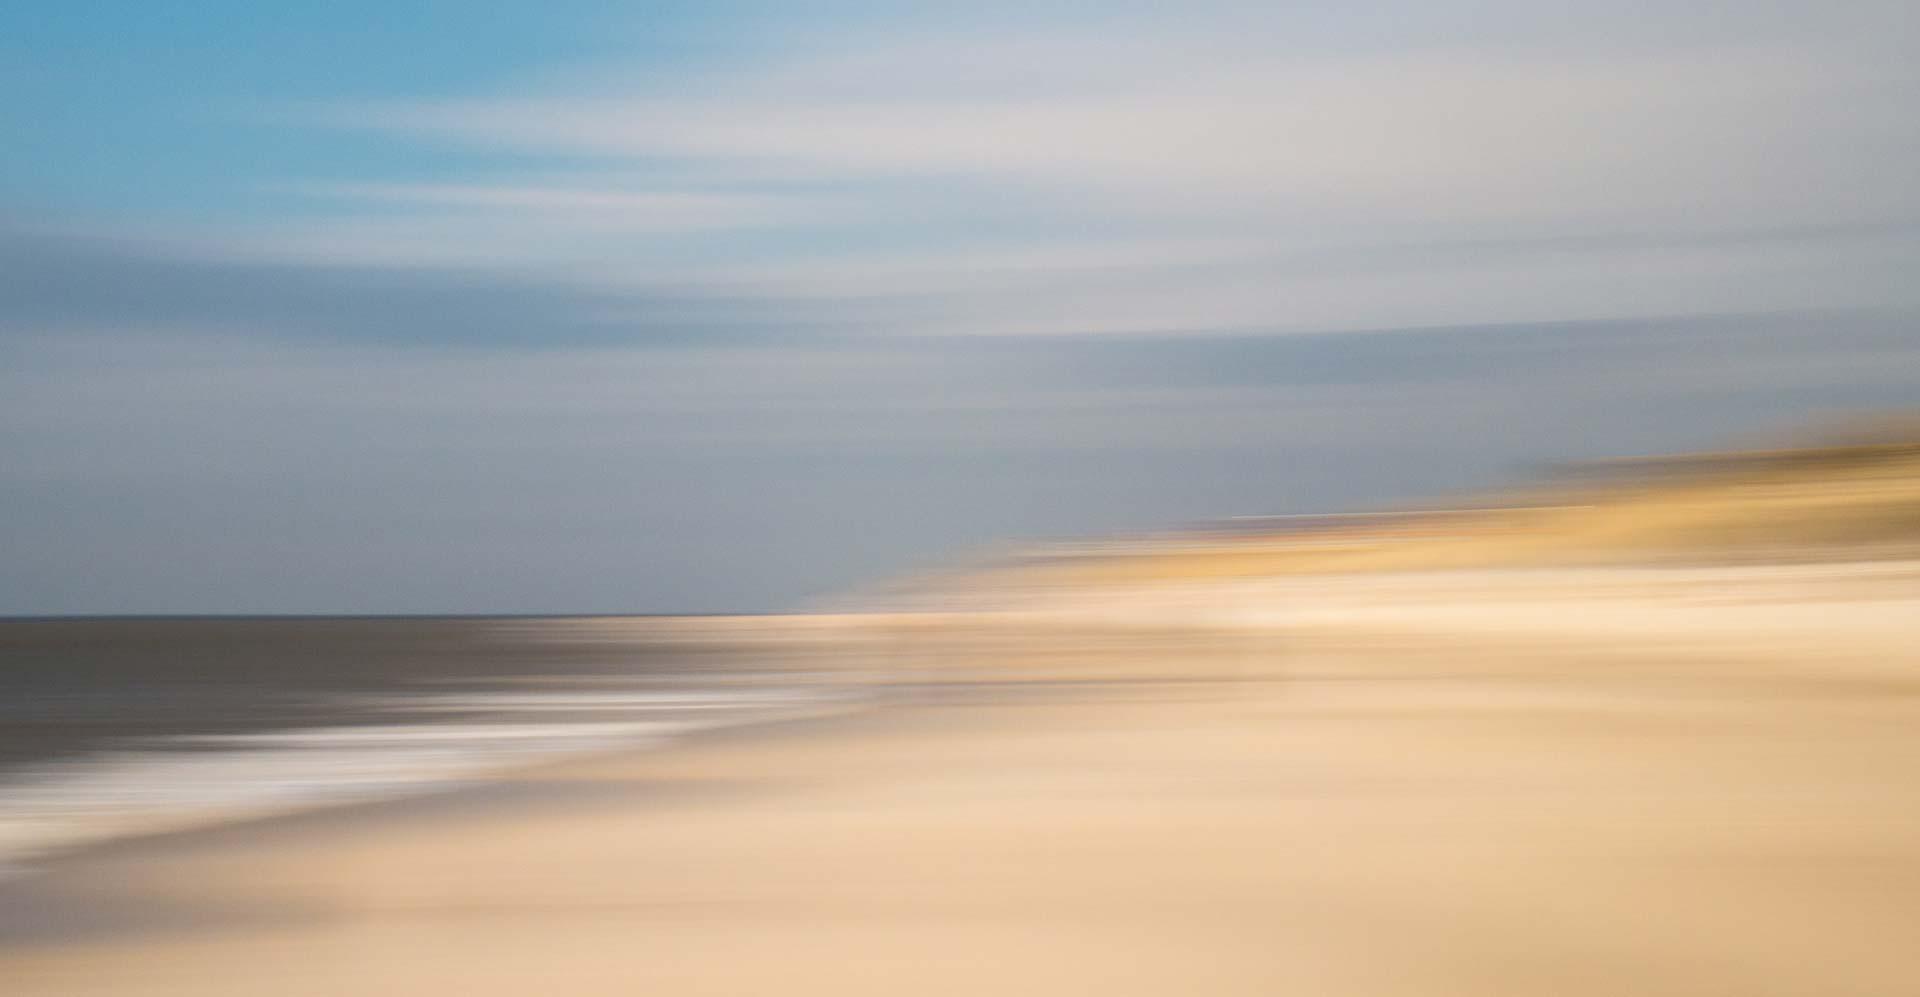 sylt strand bei wenningstedt